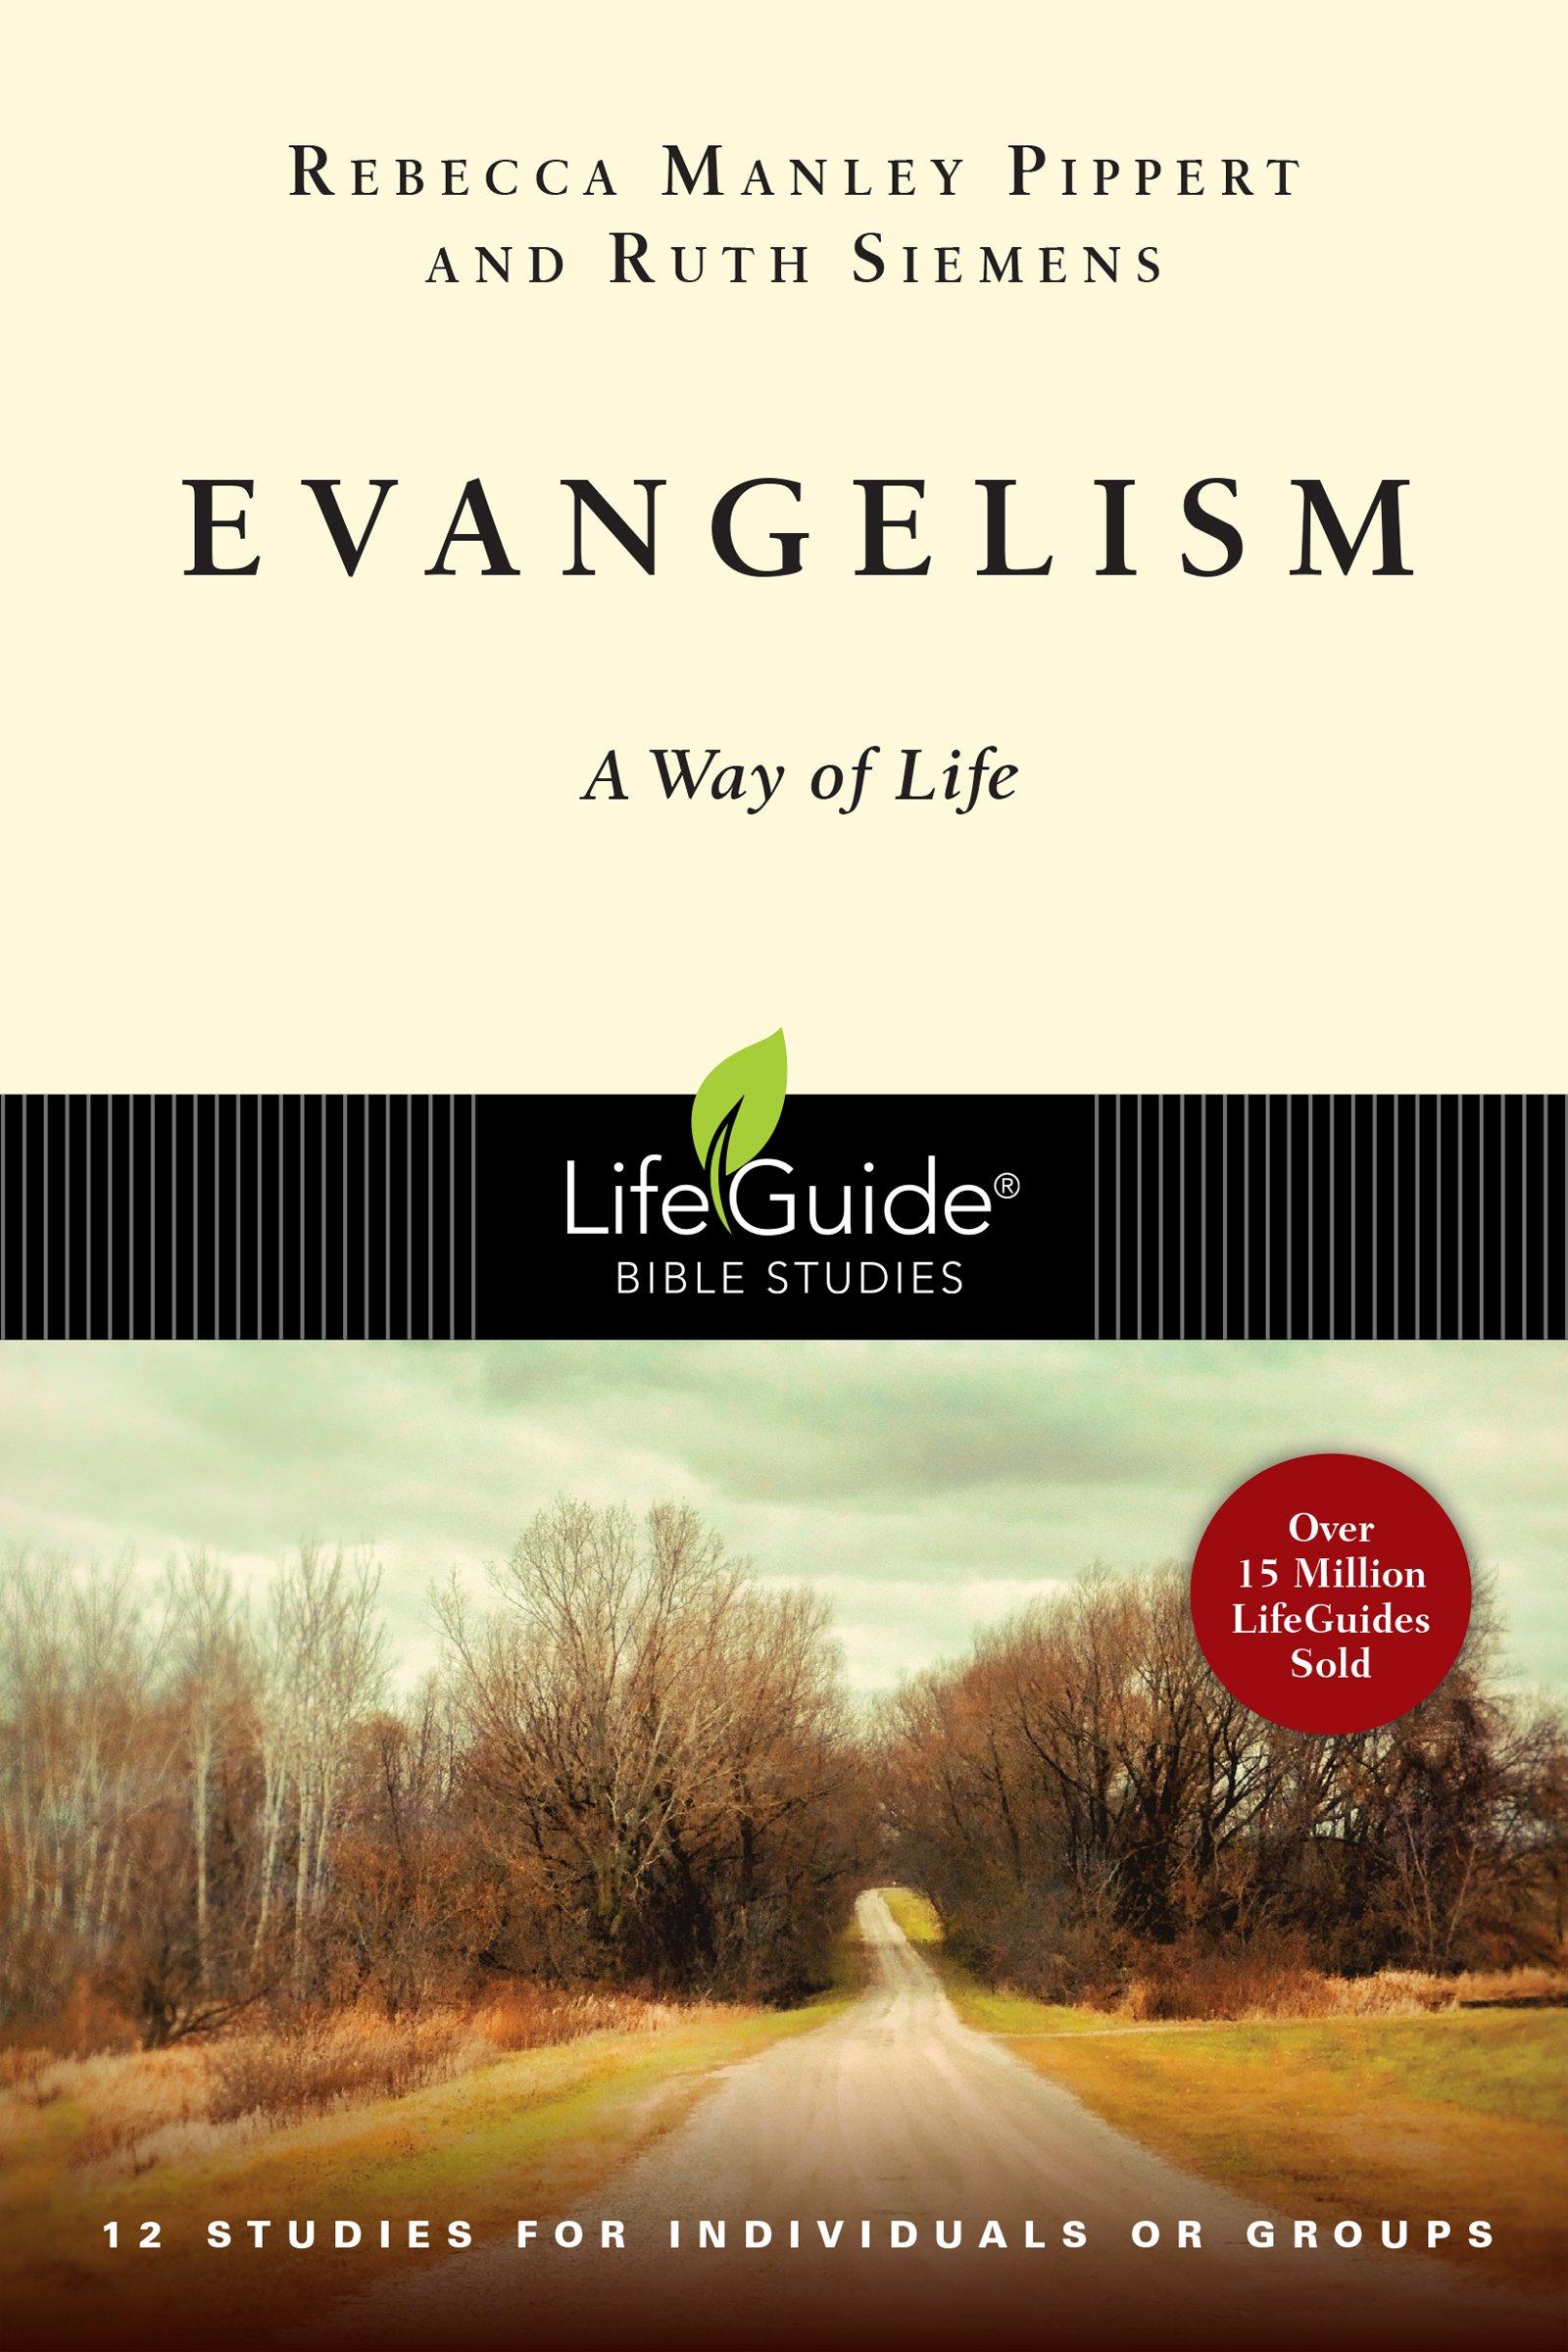 Download Evangelism: A Way of Life (Lifeguide Bible Studies) PDF